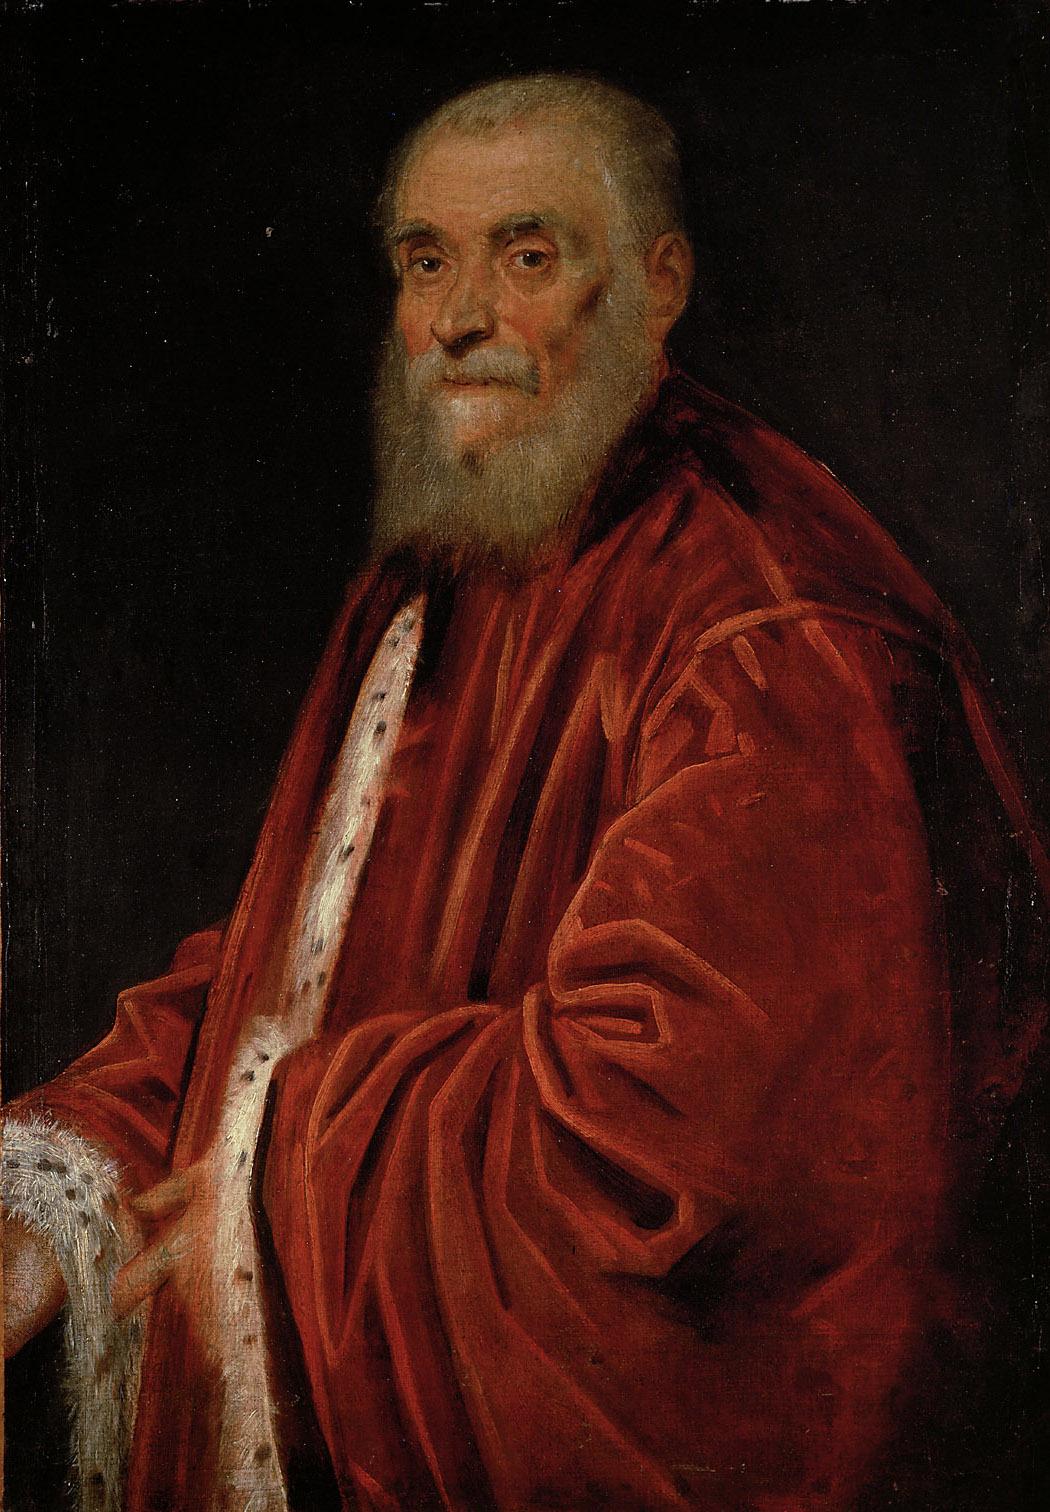 Bildnis des Senators Marco Grimani (gest. 1583) von Jacopo Robusti, gen. Tintoretto